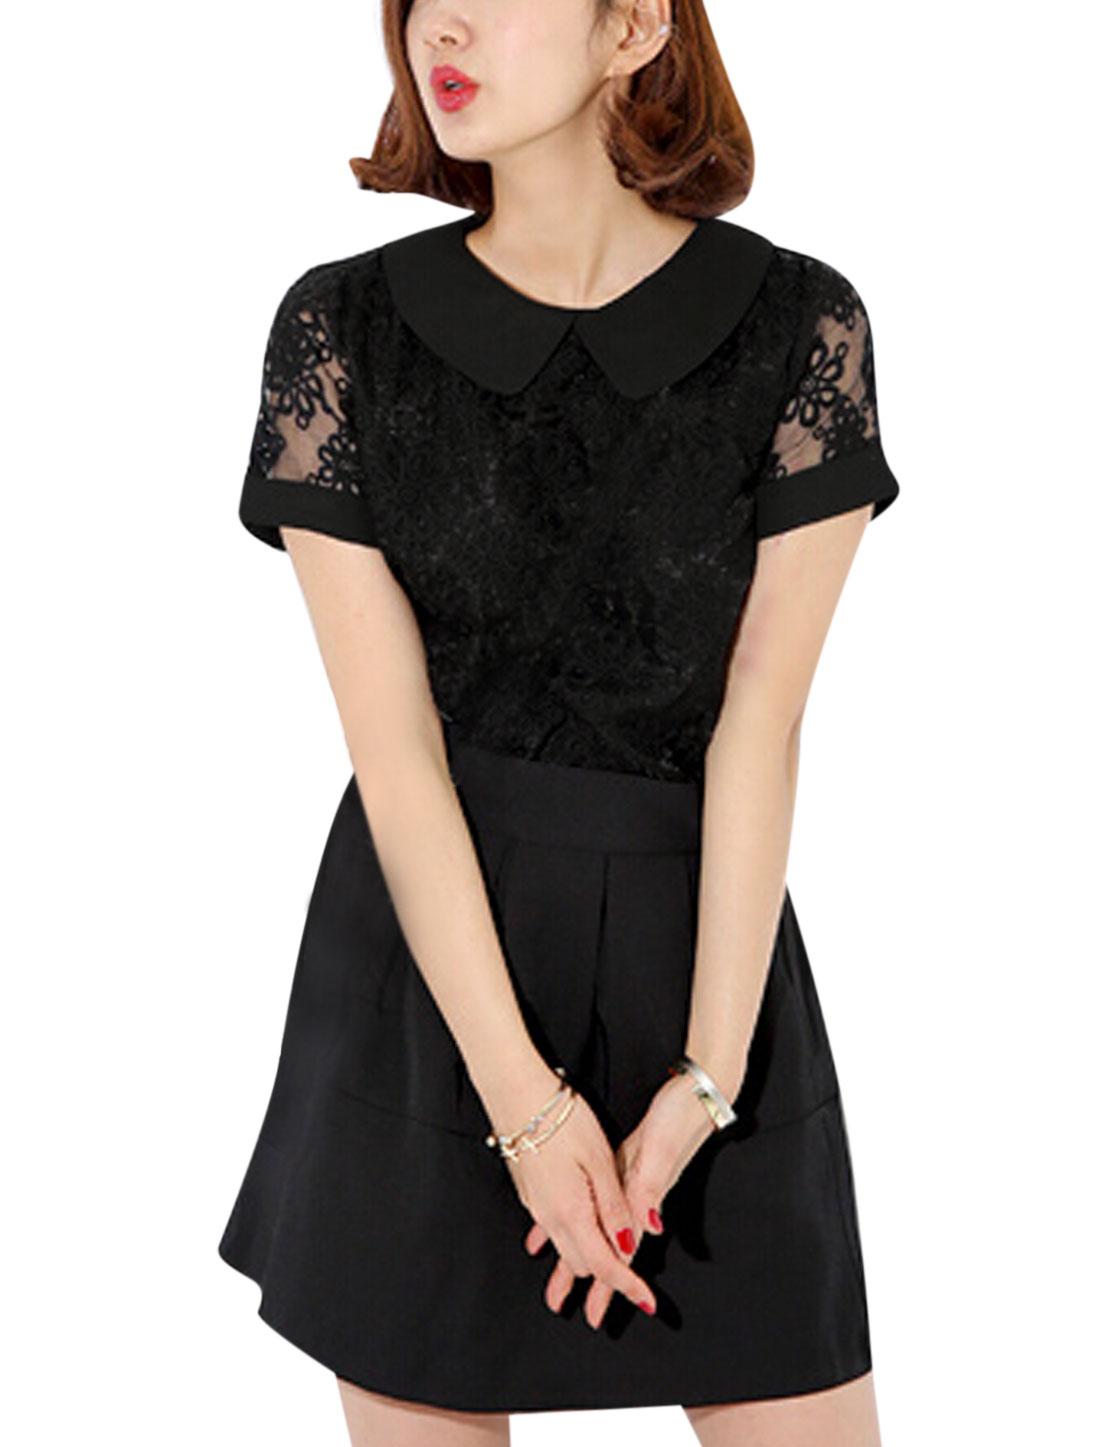 Ladies Short Sleeve Peter Pan Collar Organza Panel Casual Blouse Black XS